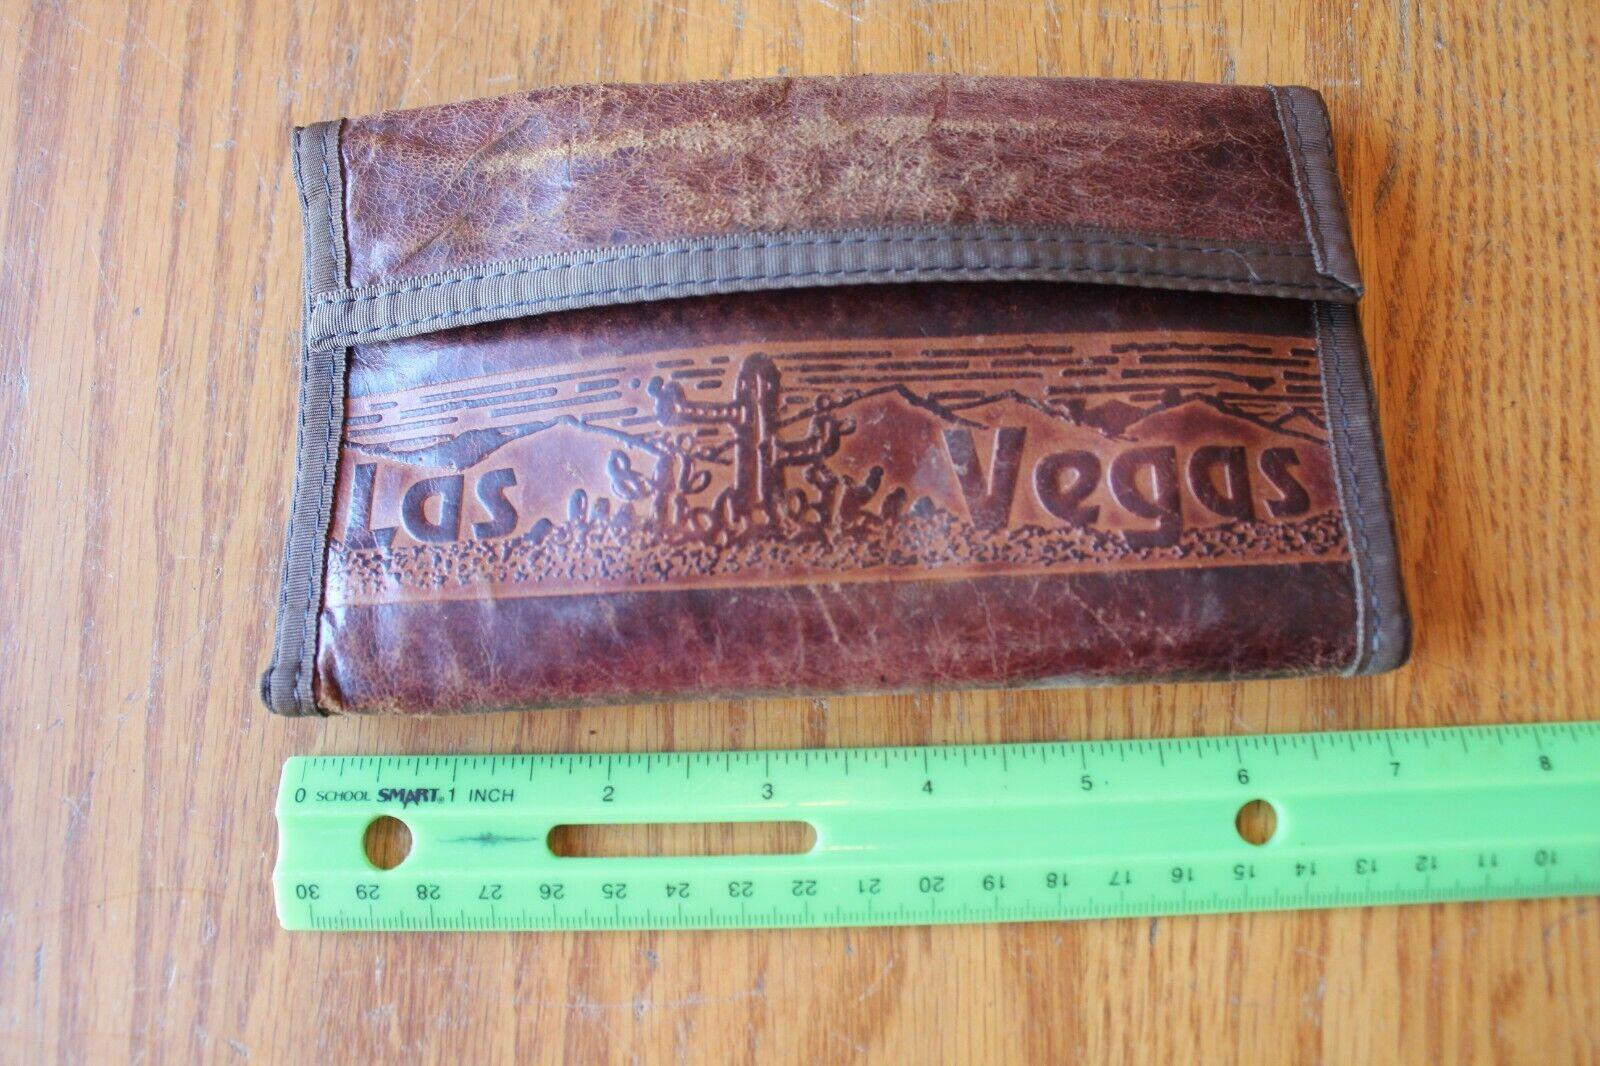 Las Vegas Leather hand made wallet cactus design vintage souvenir embossed